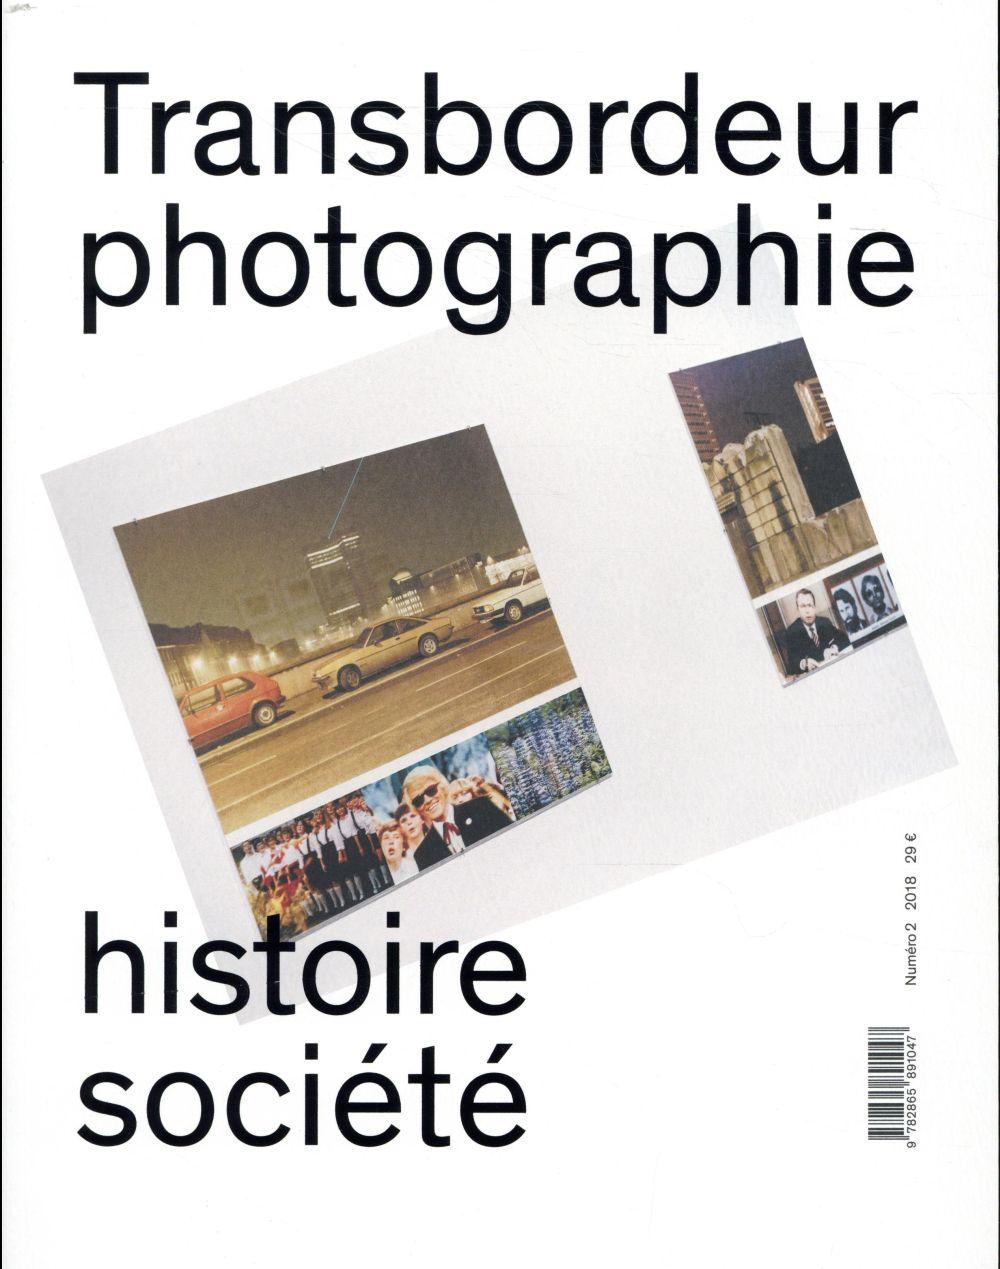 TRANSBORDEUR PHOTOGRAPHIE 2